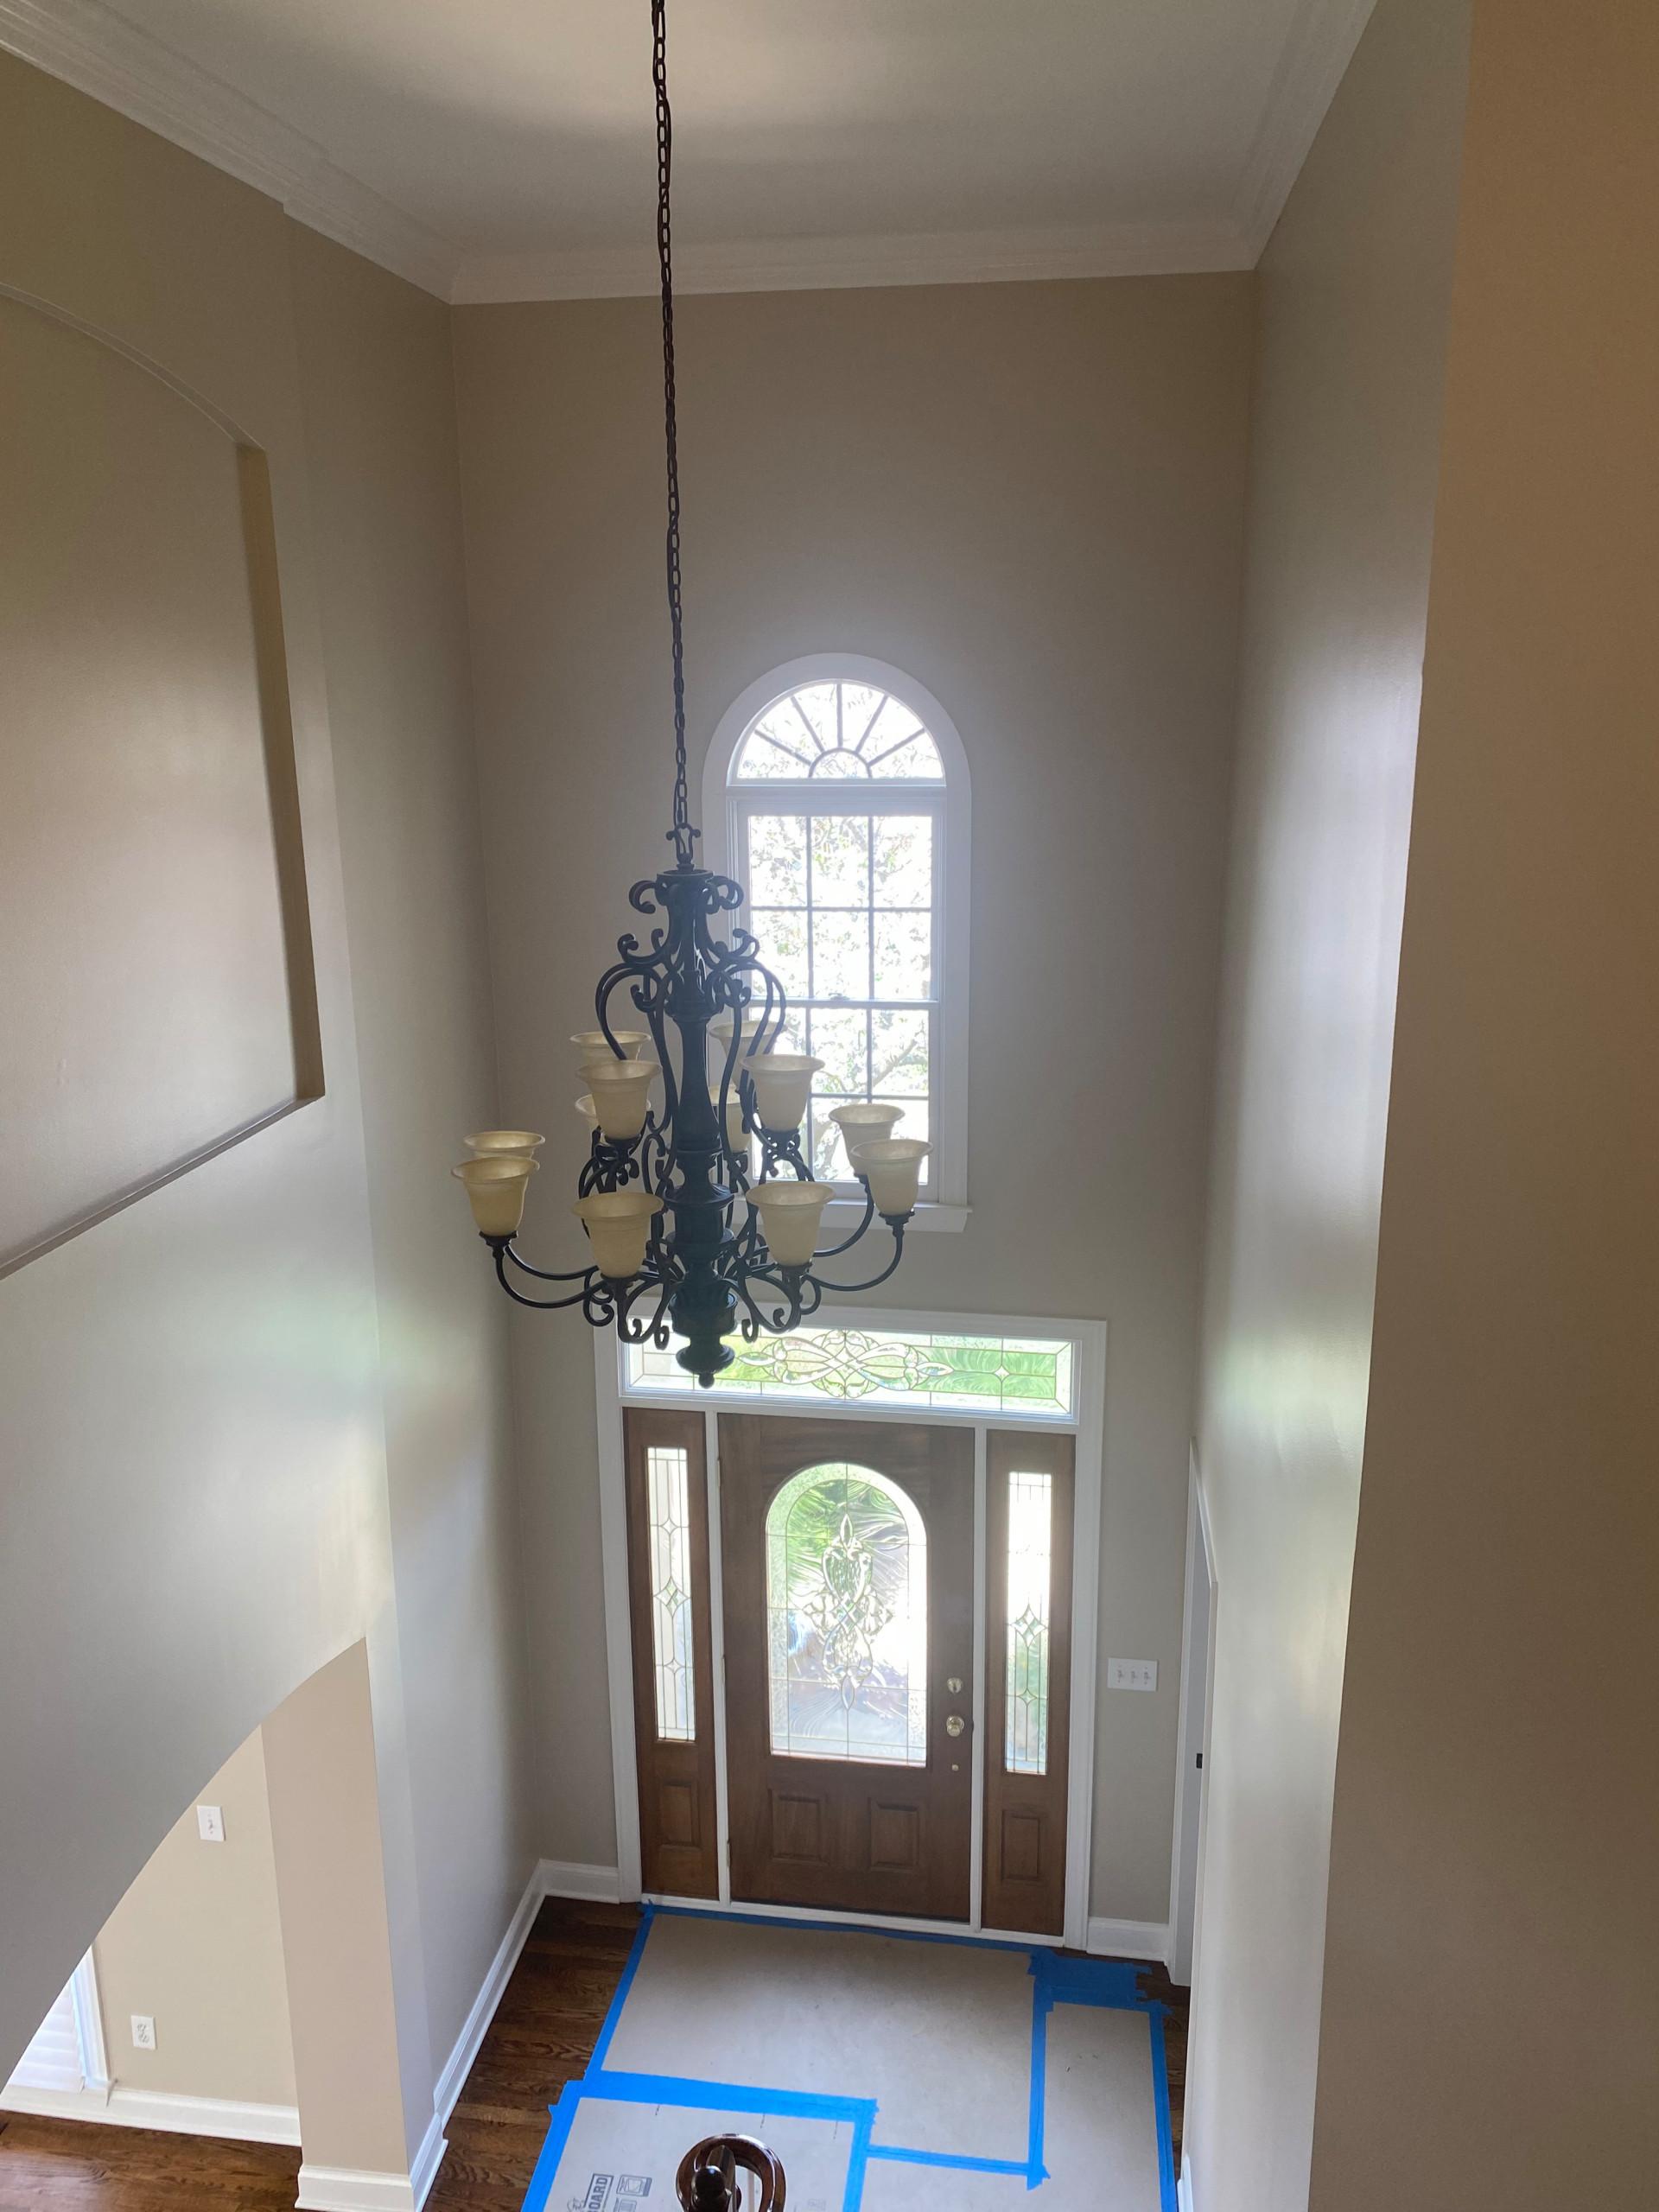 Interior Painting of Hallway